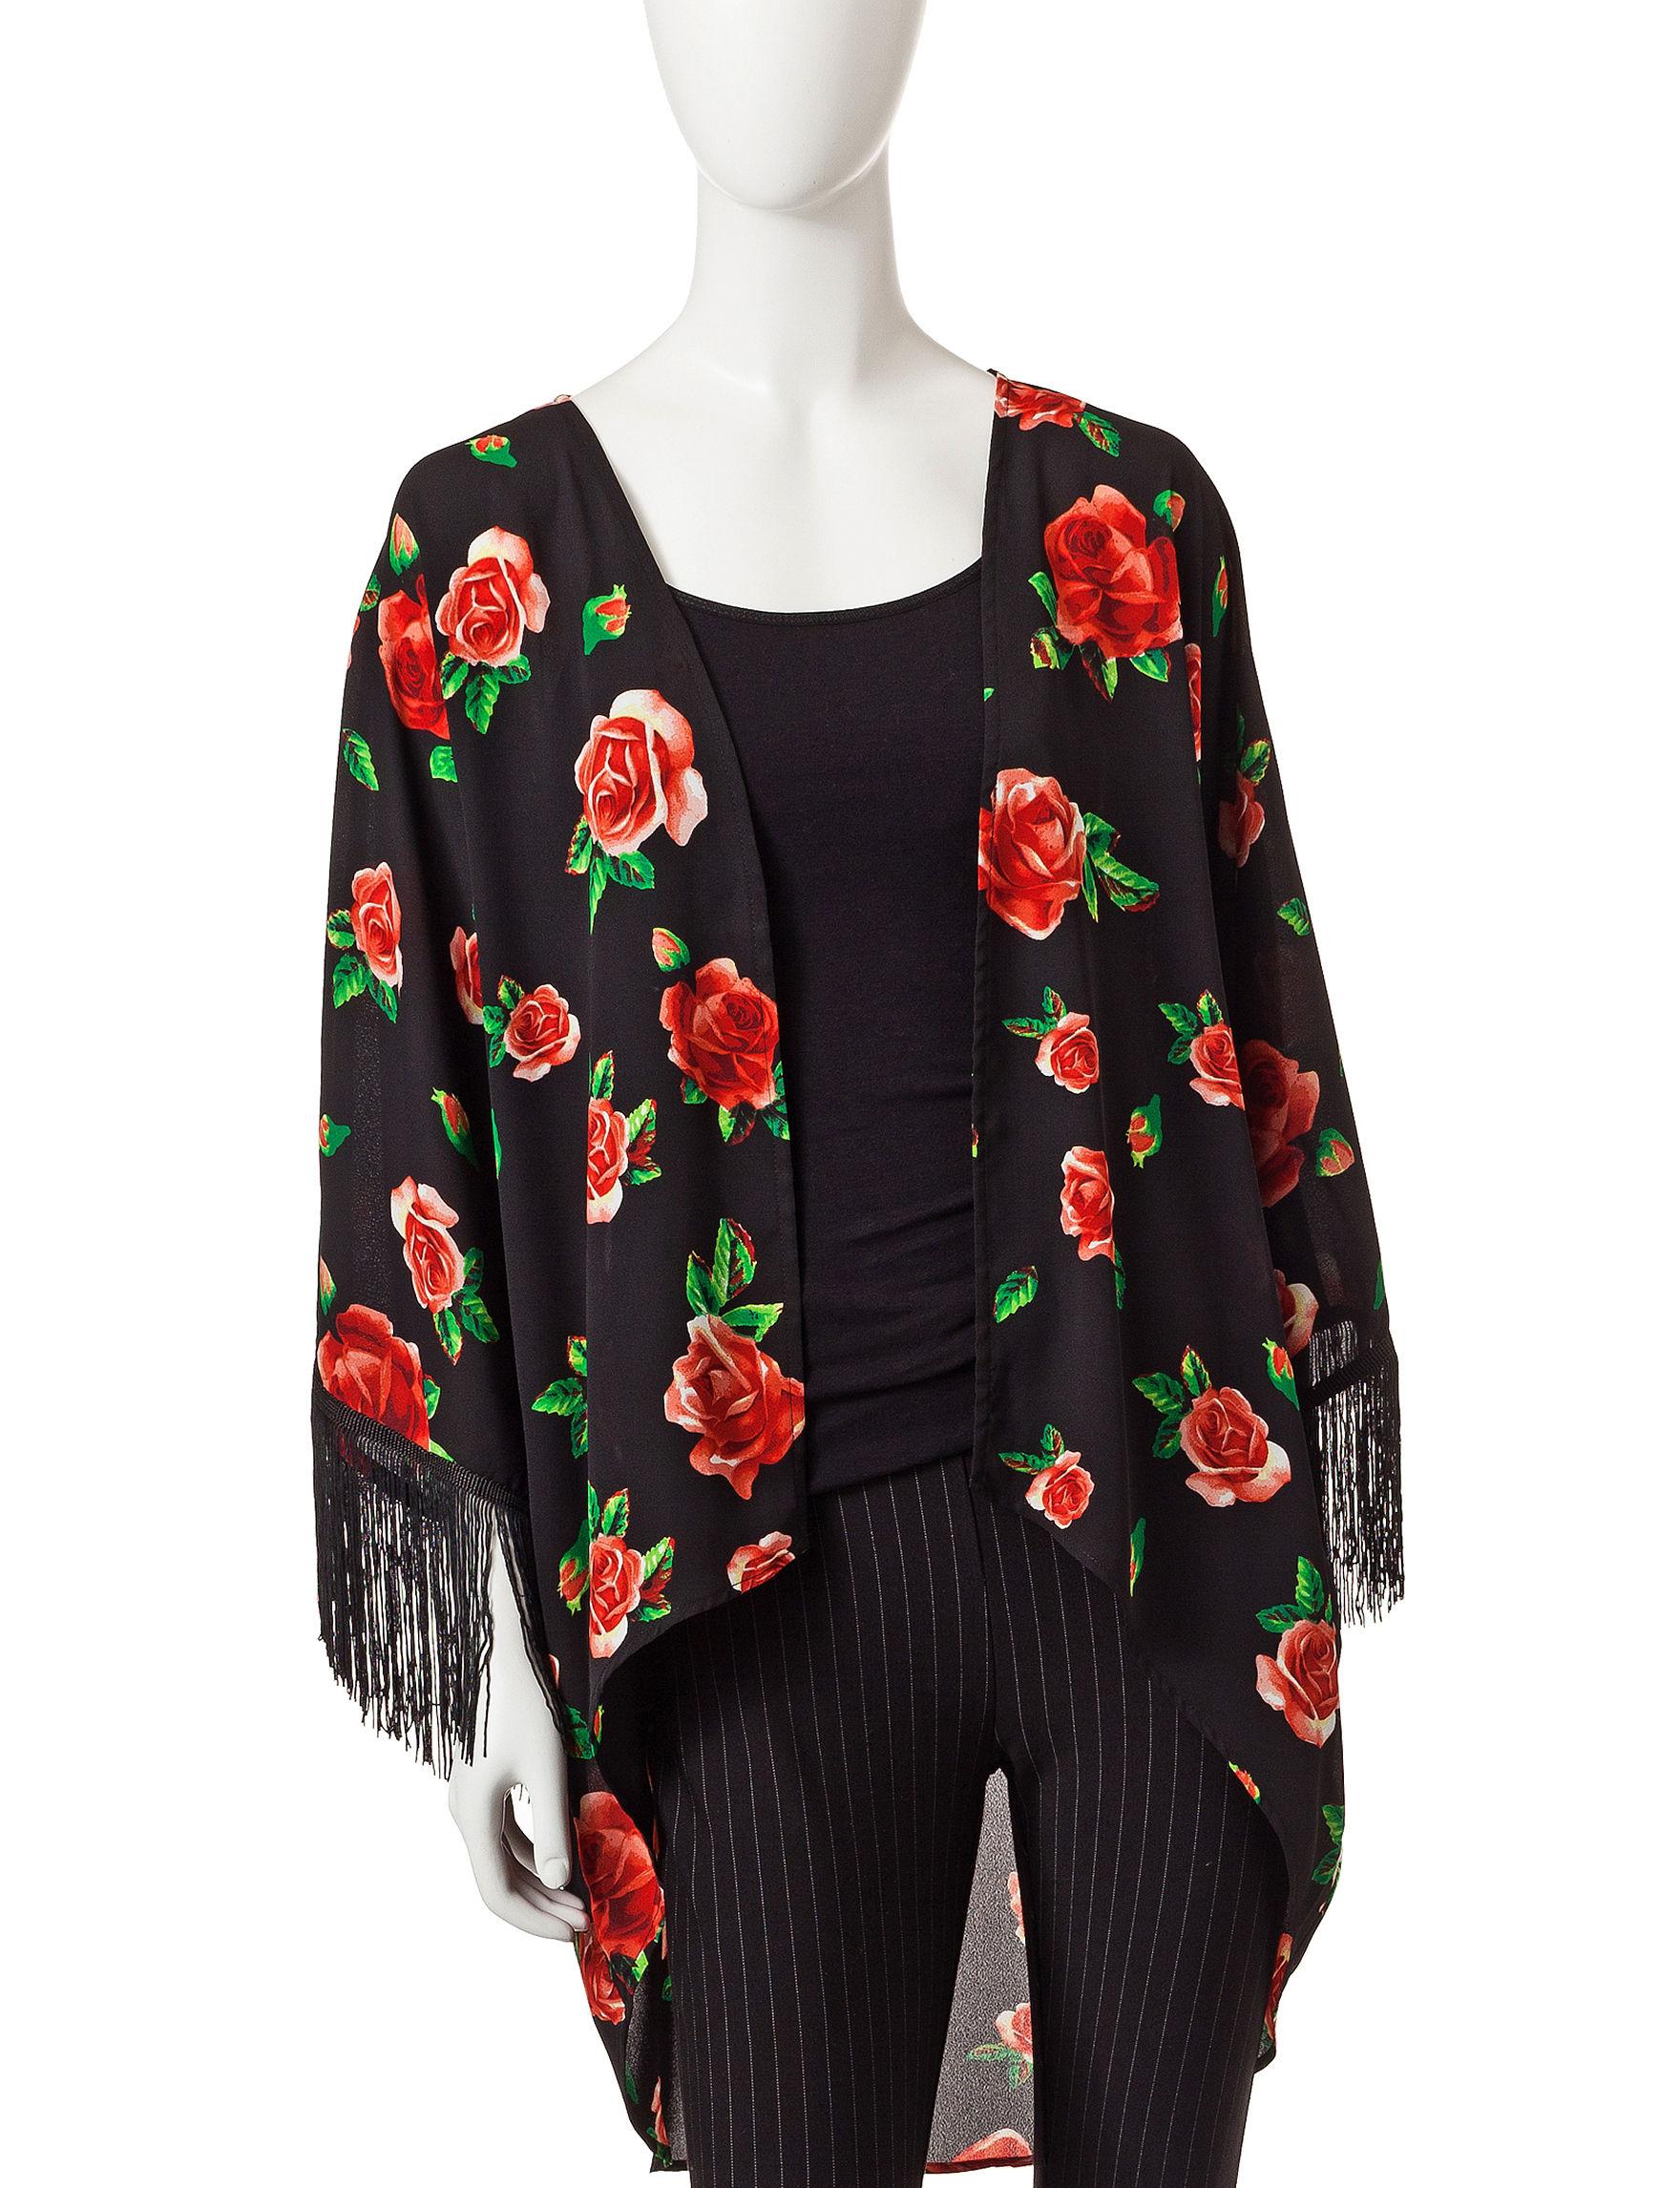 Romeo + Juliet Couture Black Shirts & Blouses